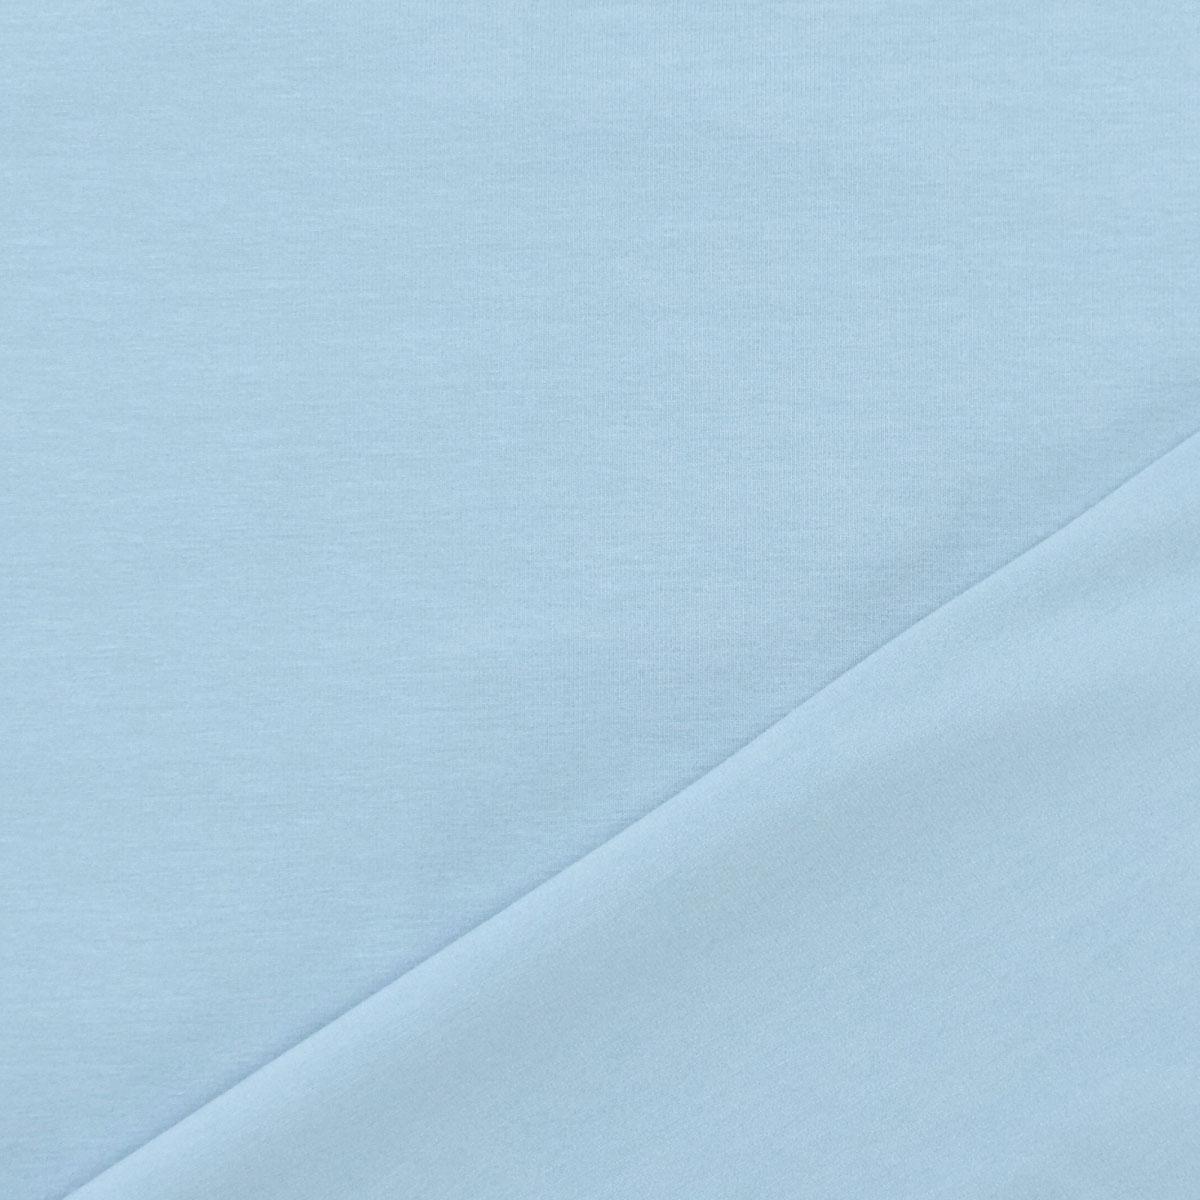 Baumwolljersey uni Meterware pastell blau 6029